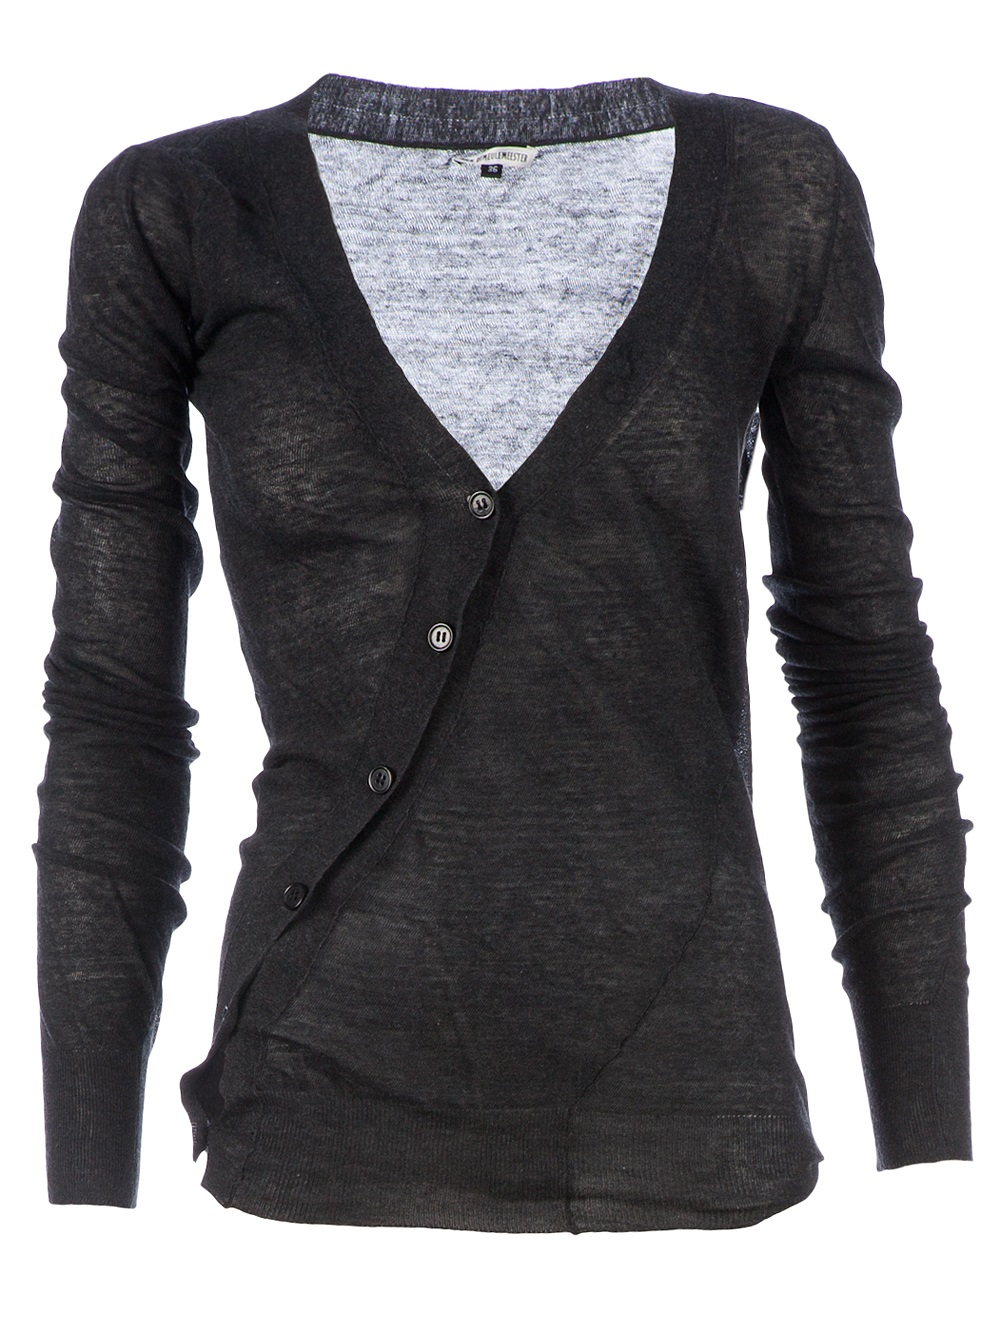 Ann demeulemeester blanche Asymmetric Sheer Cardigan in Black | Lyst